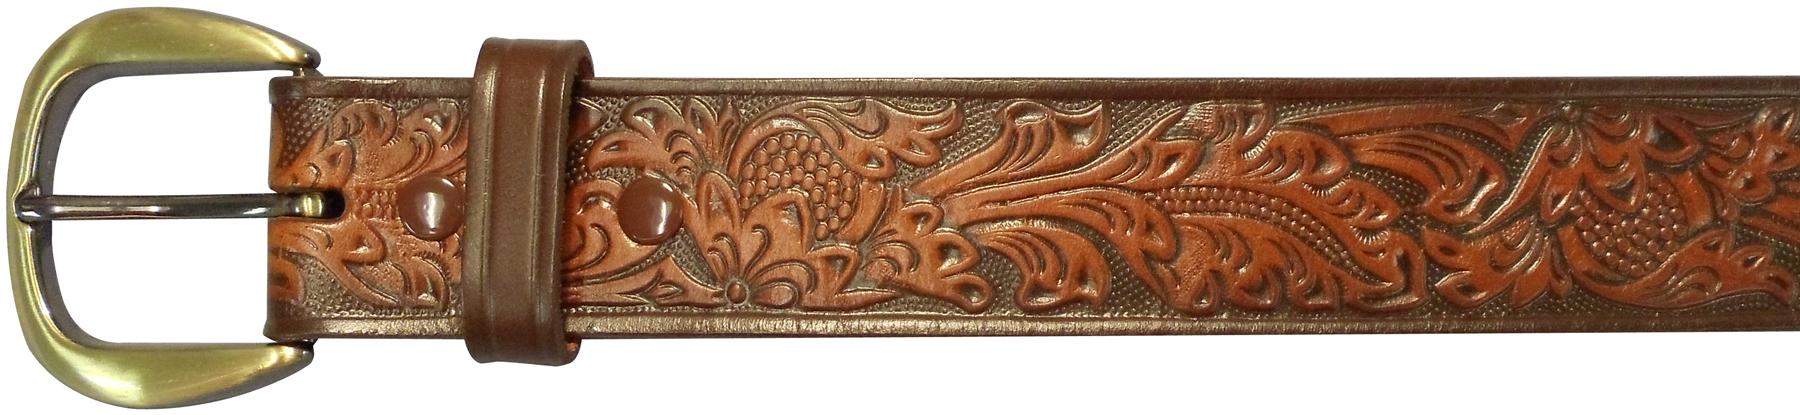 "10610110234 - 34"" Brown Leather Belt"